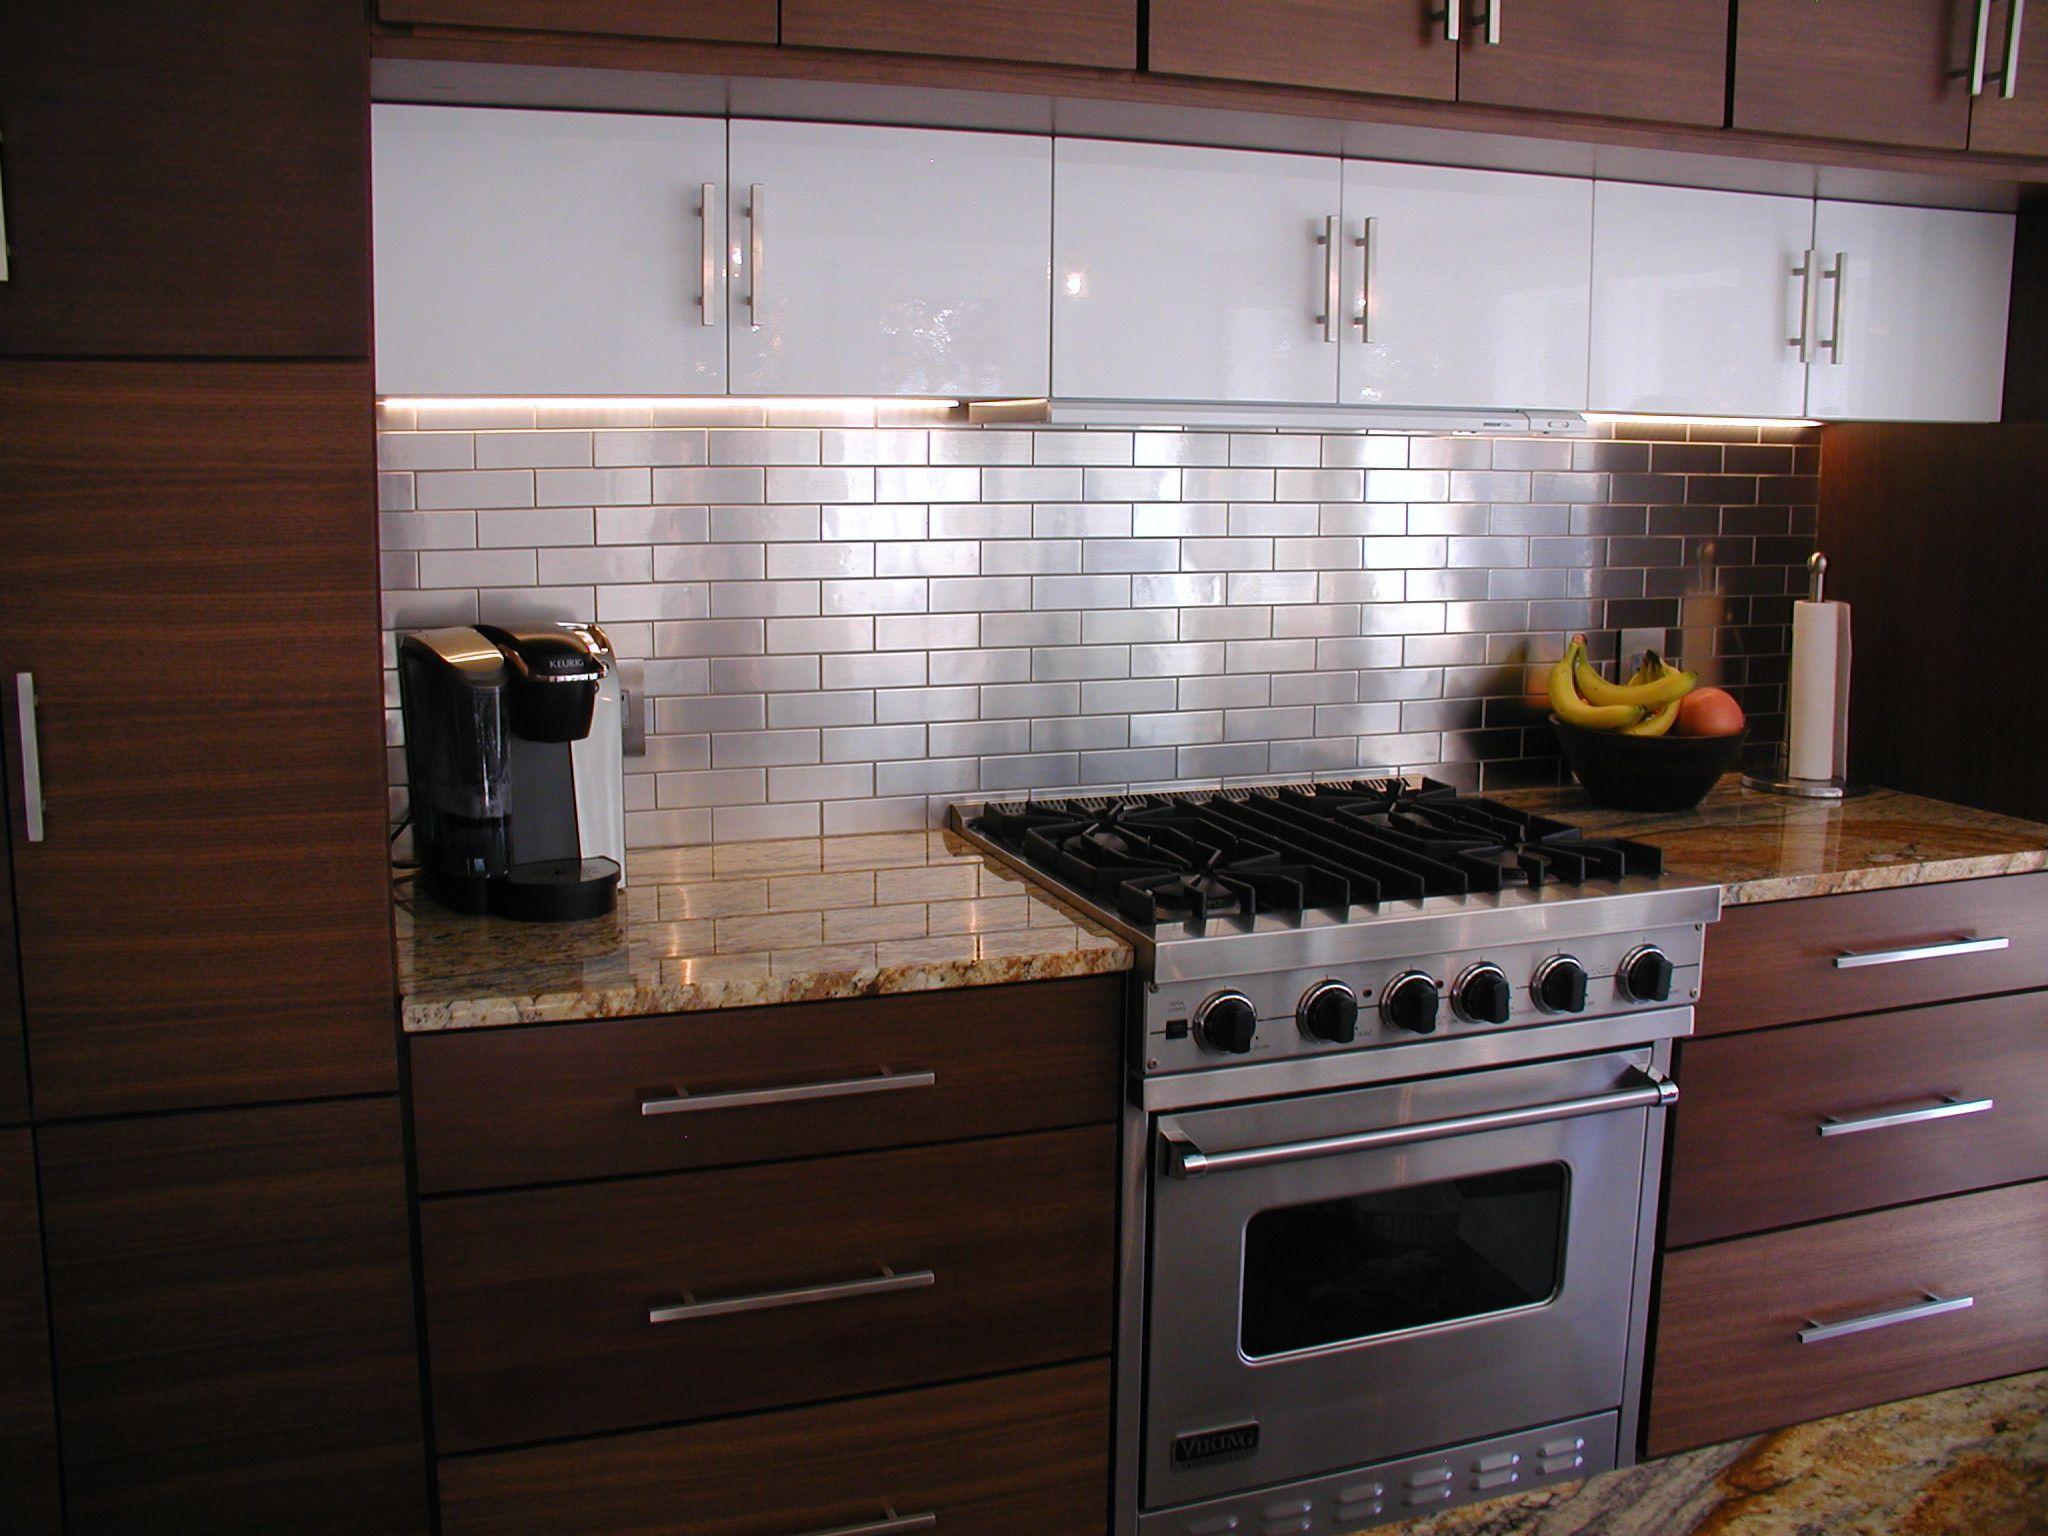 Dce Woodland Cabinets Urban Elements Metro Door Walnut Sienna Luxor Cabinets 706 Door Gloss White Cabinetry Cabinet Design